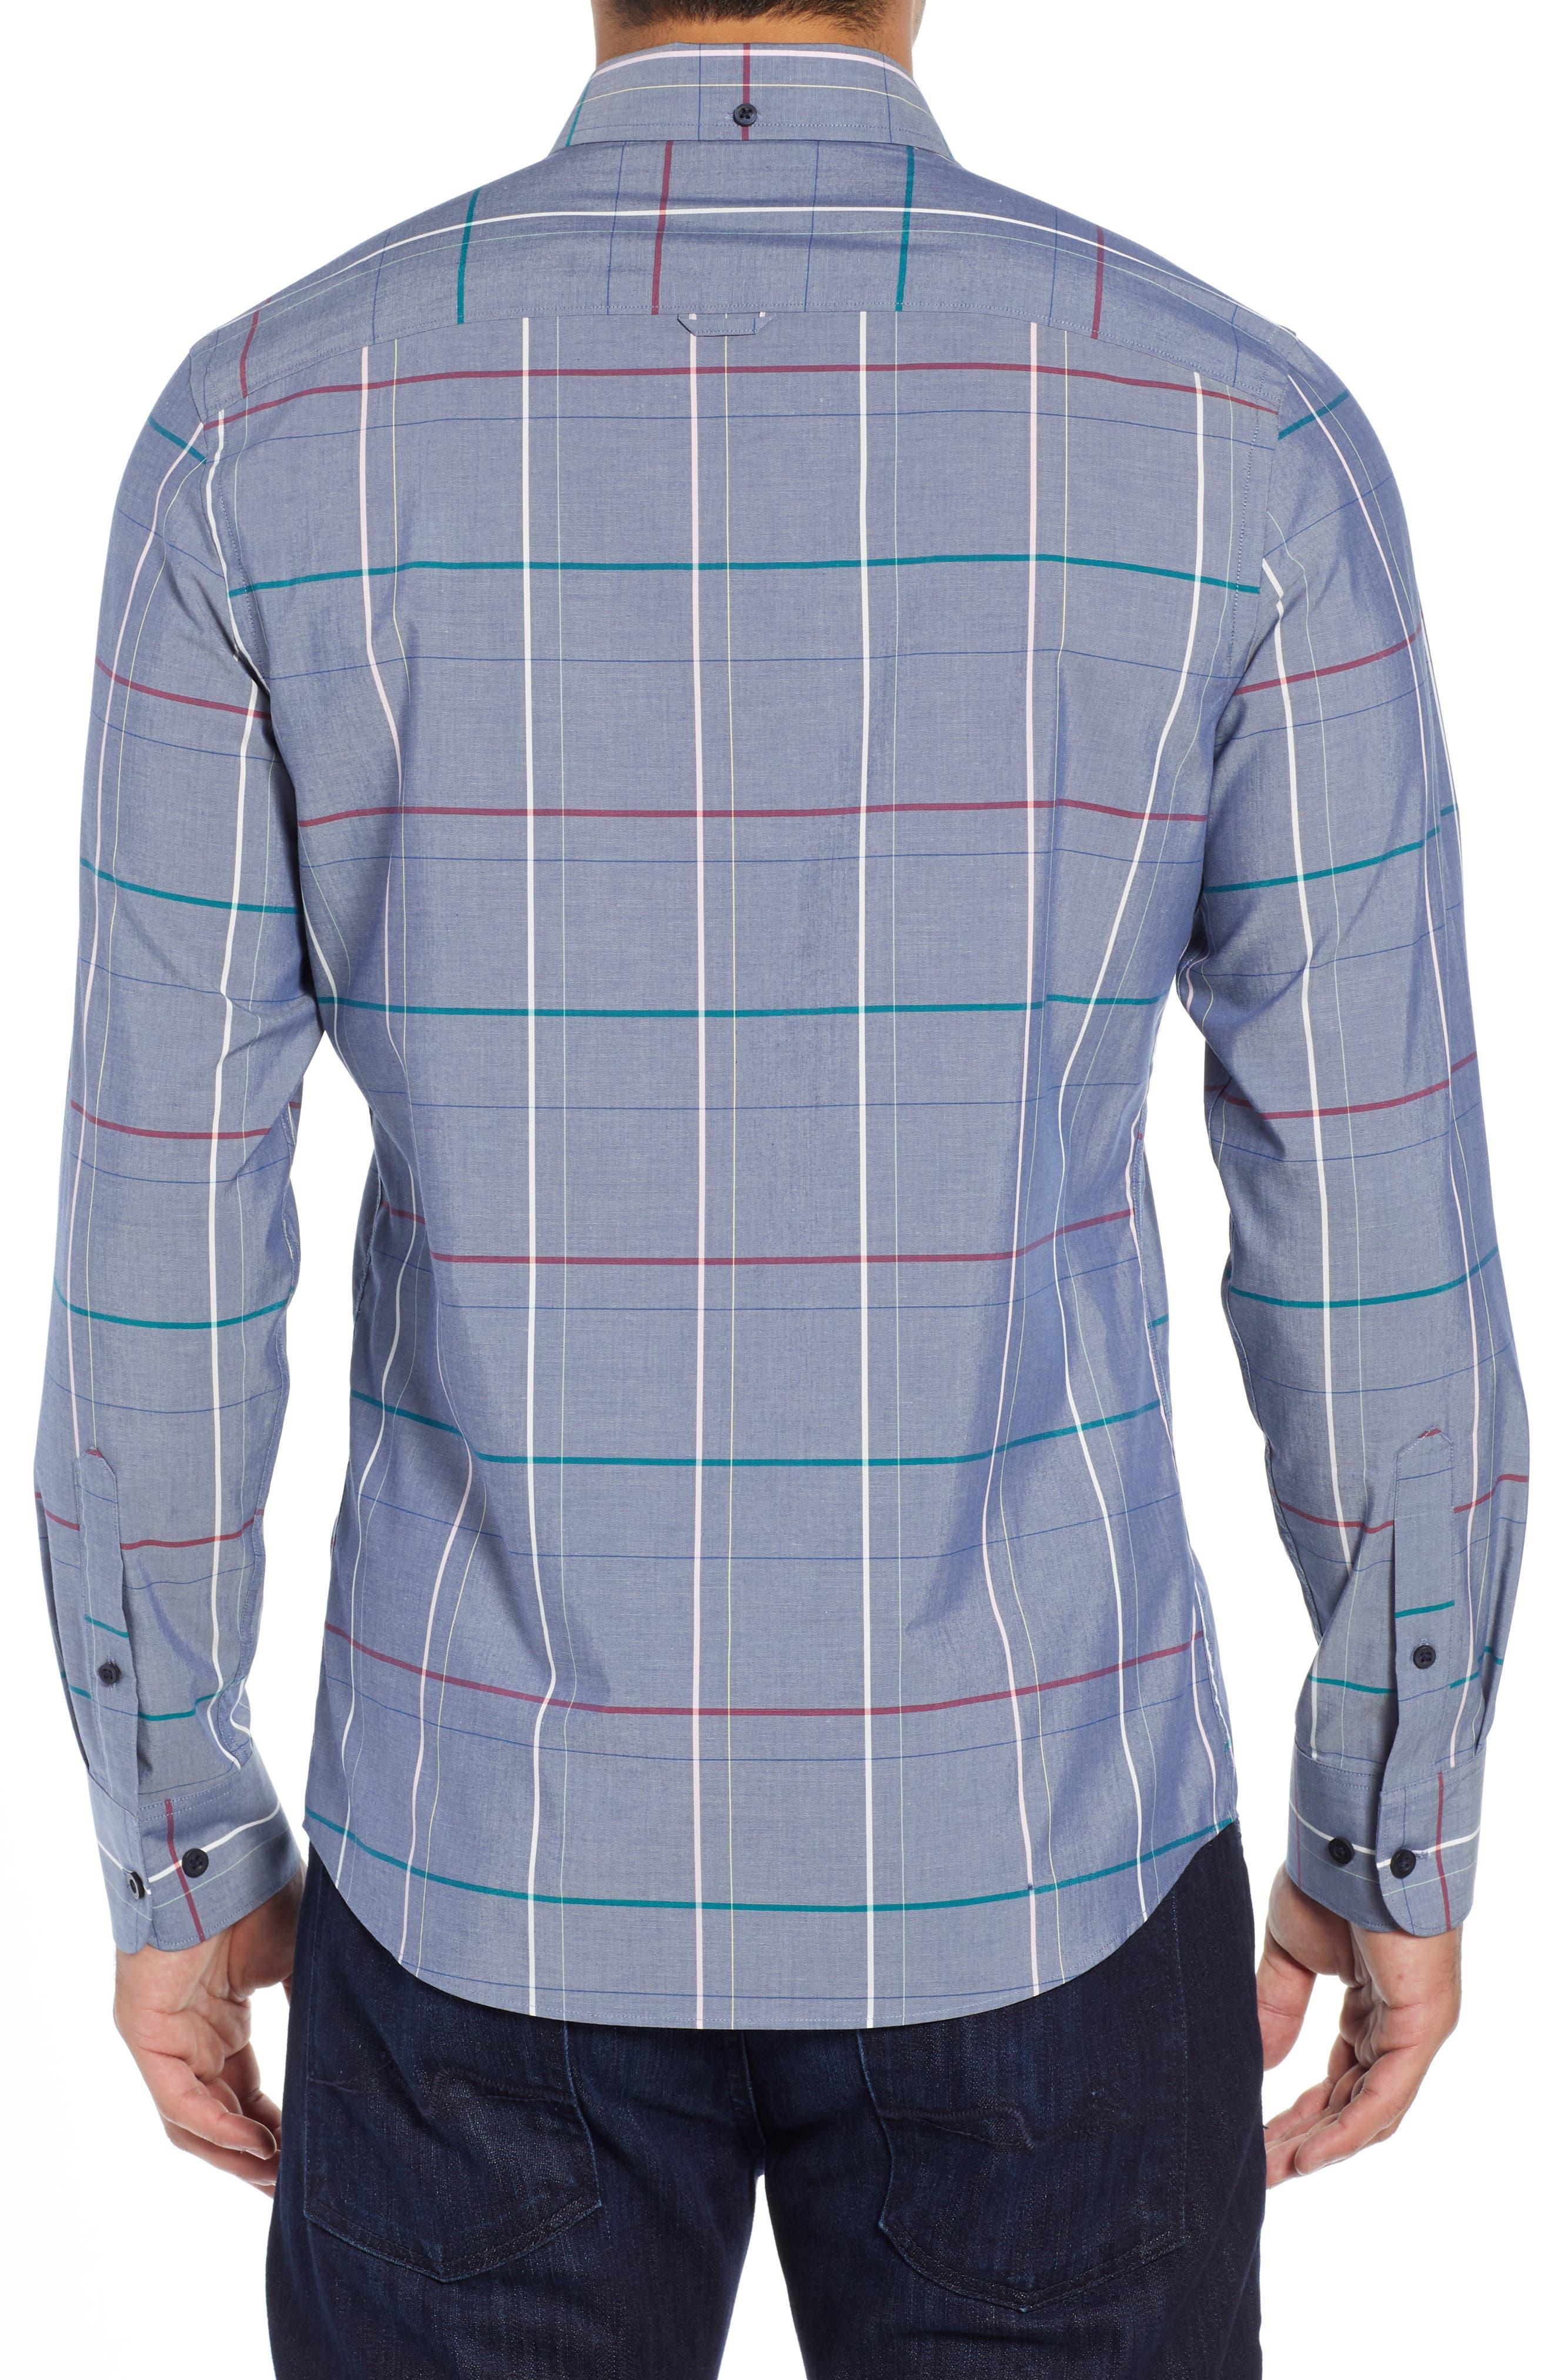 Tech-Smart Slim Fit Multi Pane Sport Shirt,                             Alternate thumbnail 3, color,                             BLUE CHAMBRAY MULTI PANE